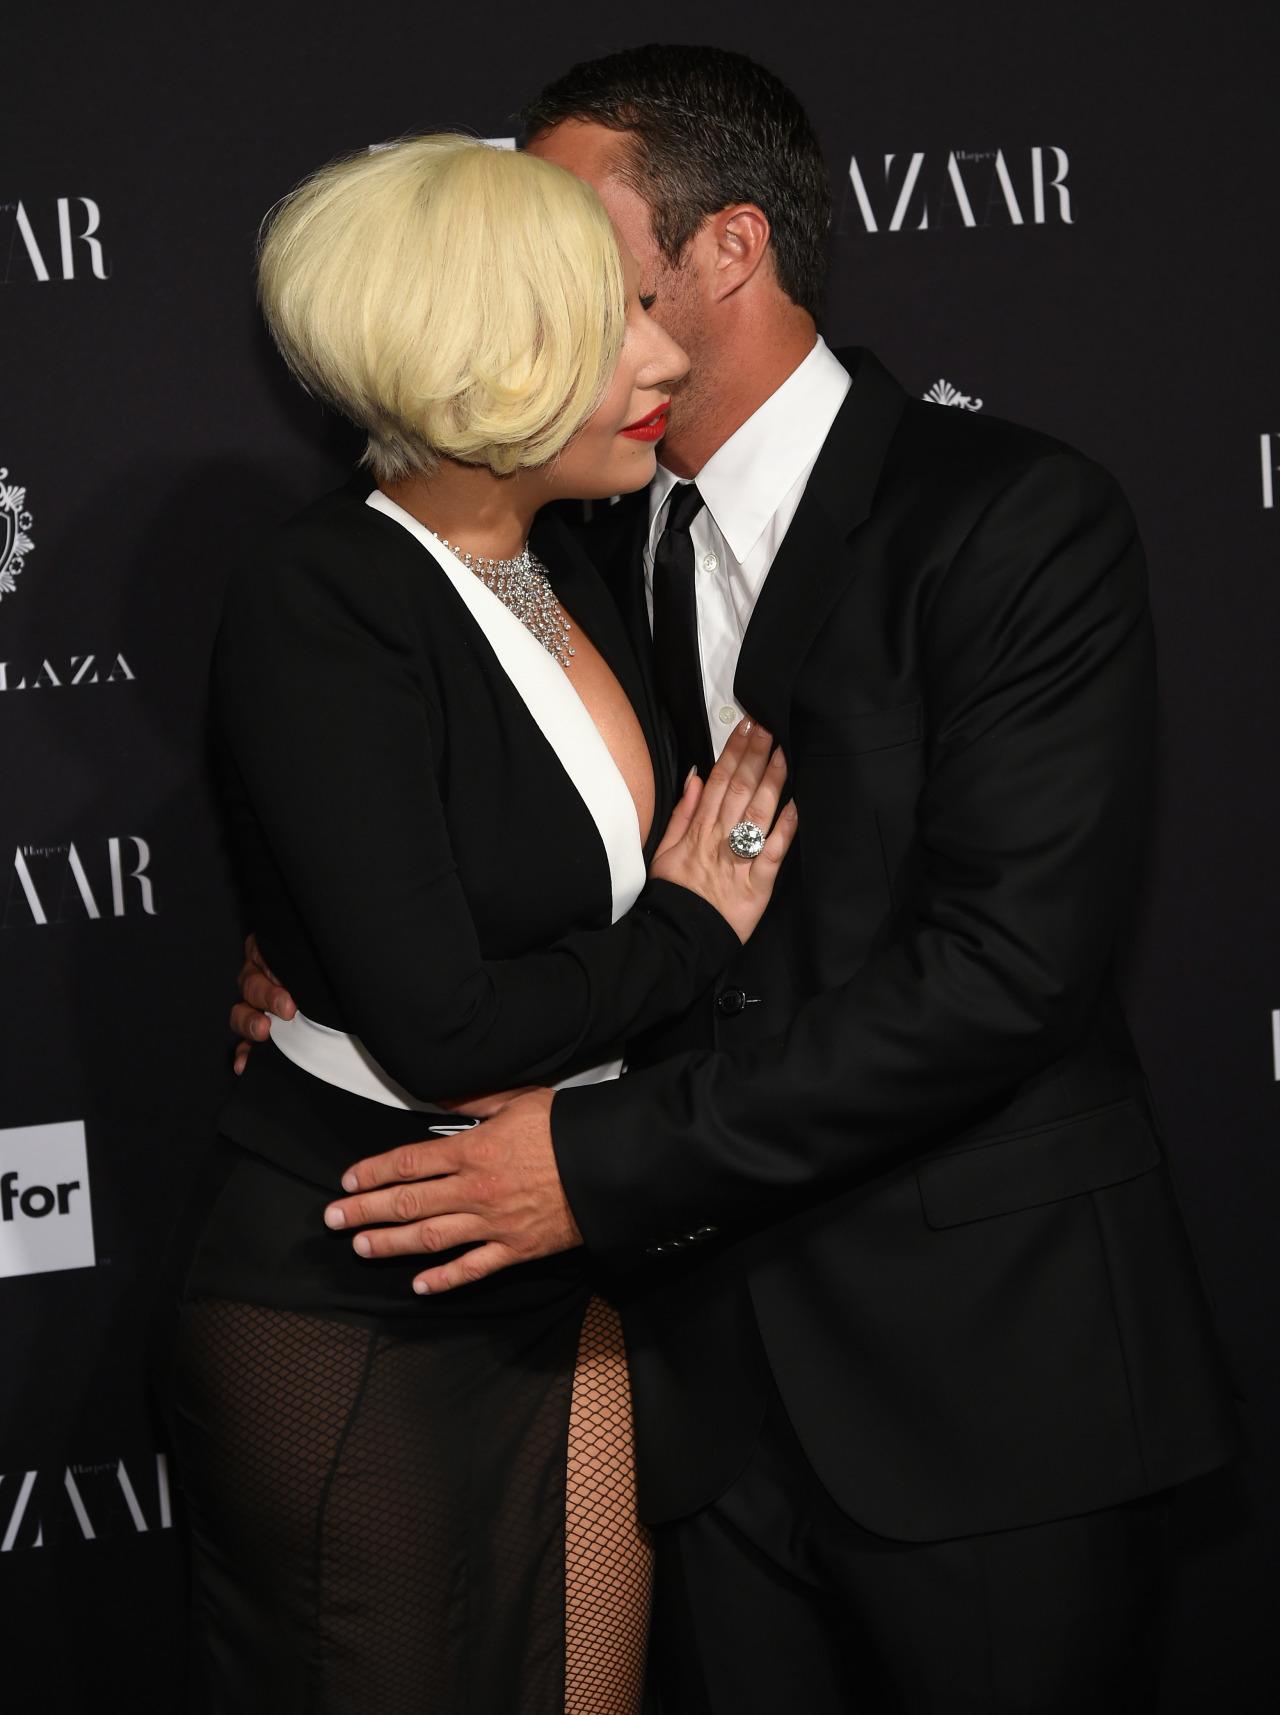 Lady Gaga and Taylor Kinney. - Page 3 Tumblr_nbhkz0oEqB1rz7rr7o4_1280